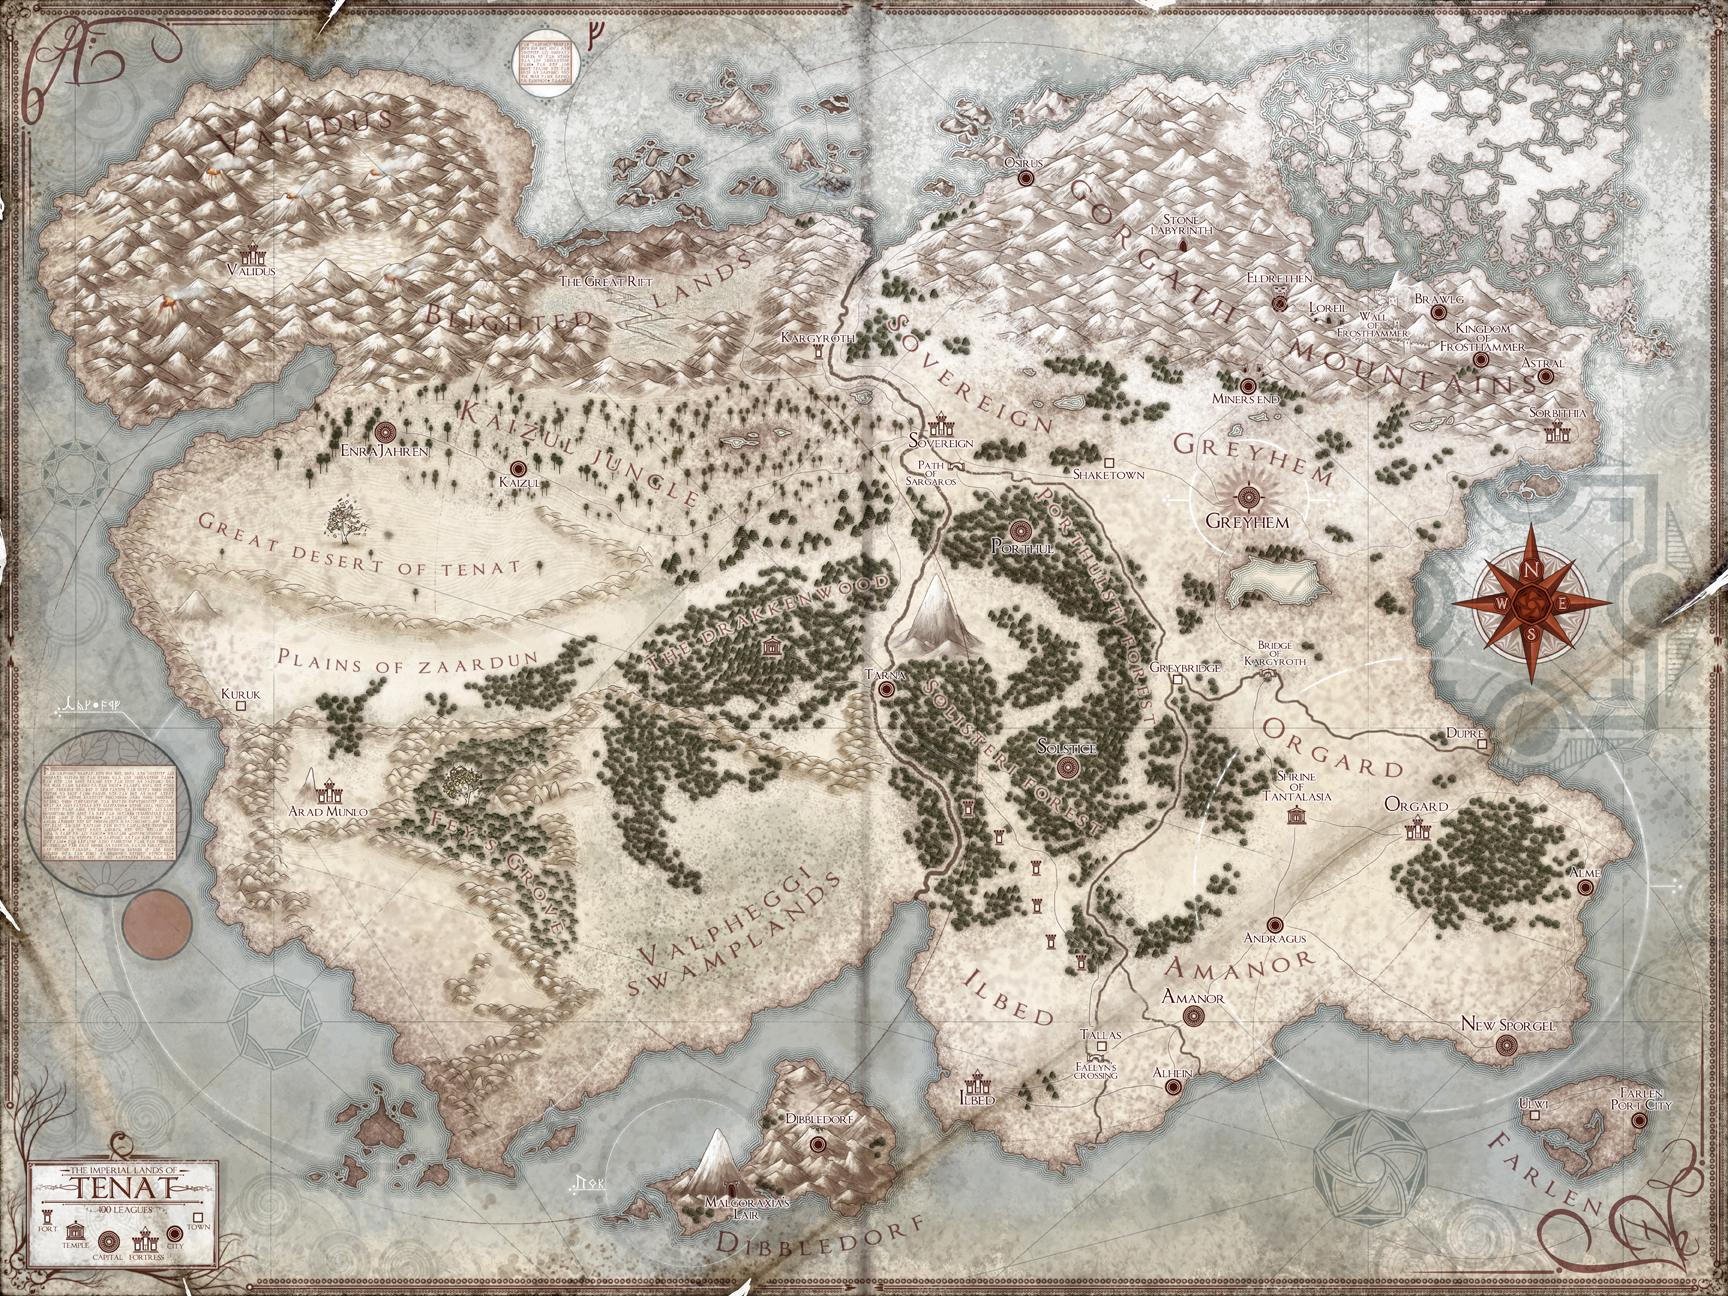 The Lands of Tenat